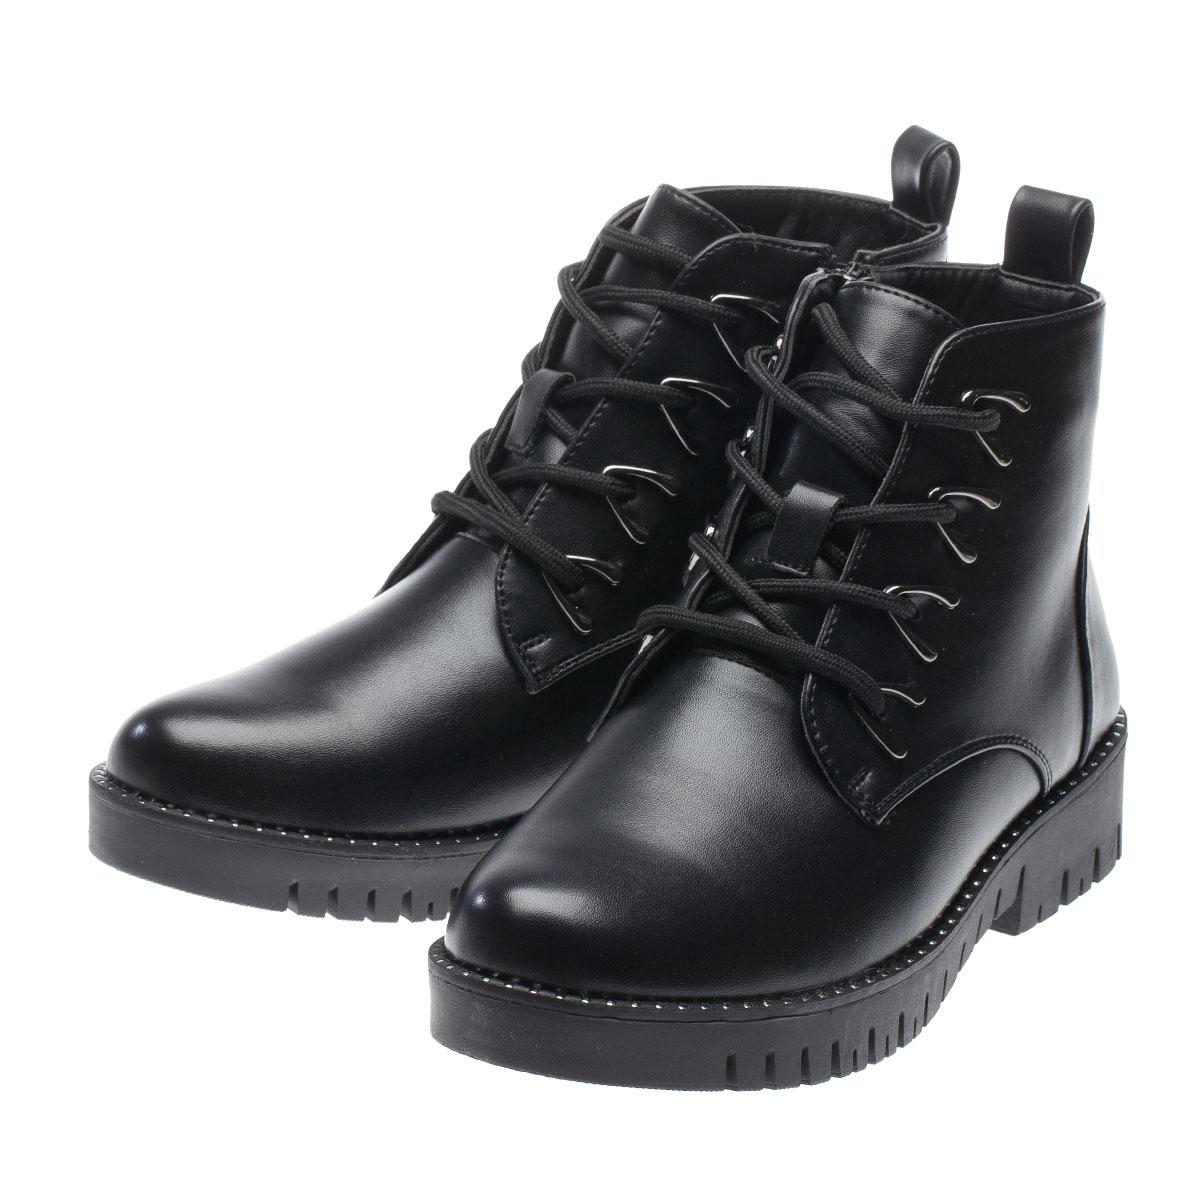 Ботинки зимние FERTO, F17-6103